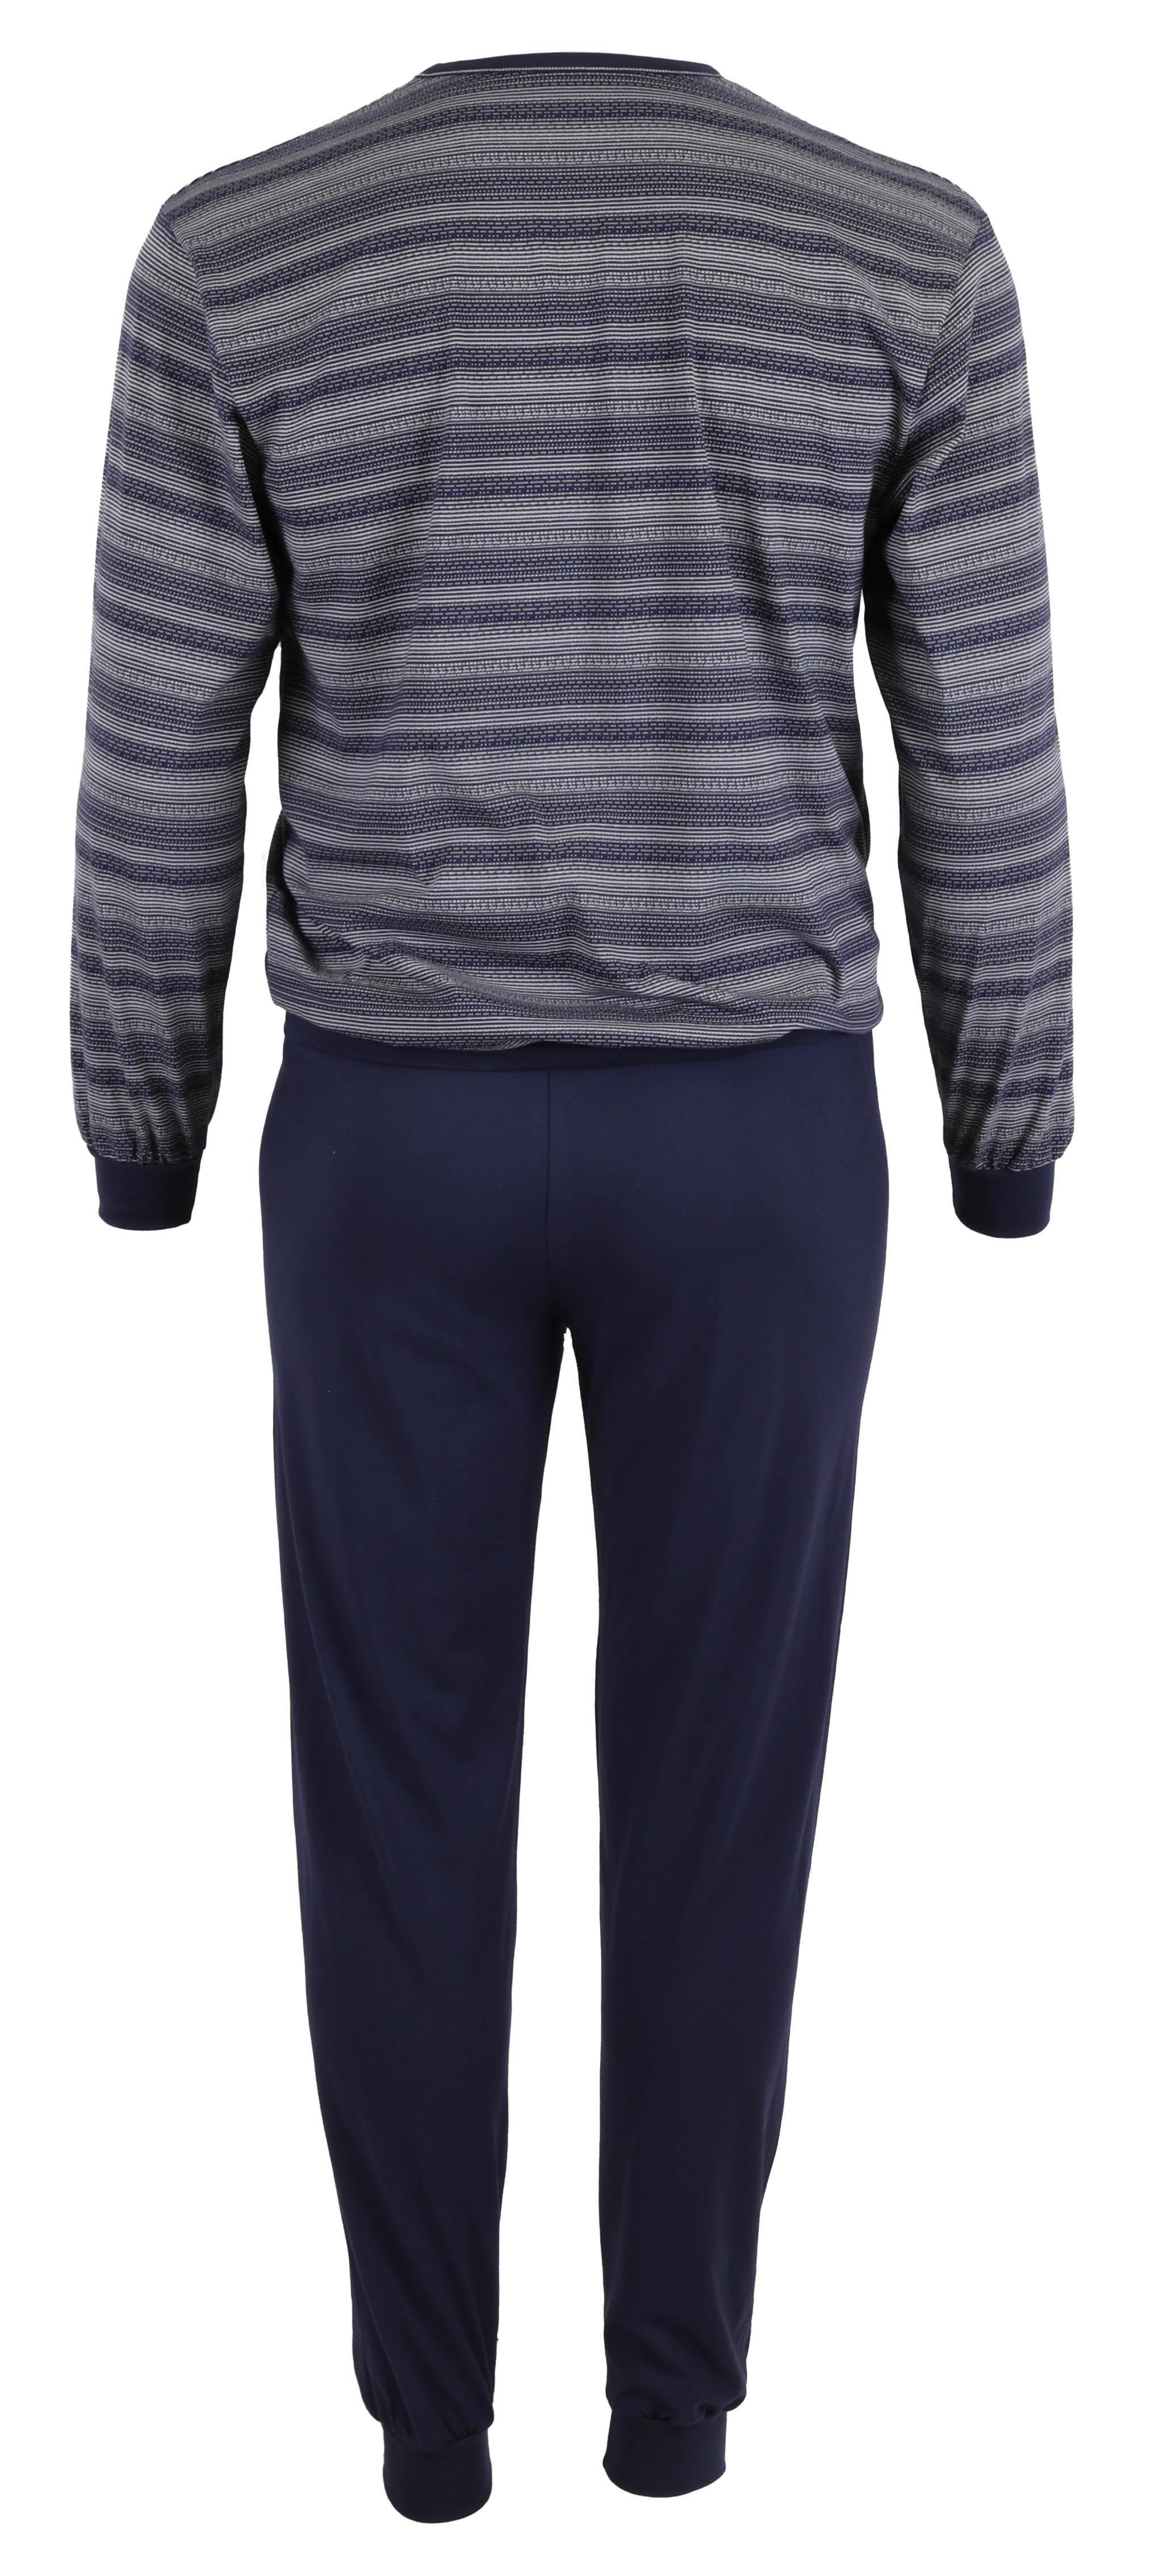 betz herren schlafanzug pyjama lang gr en 48 56 farbe navy blau. Black Bedroom Furniture Sets. Home Design Ideas